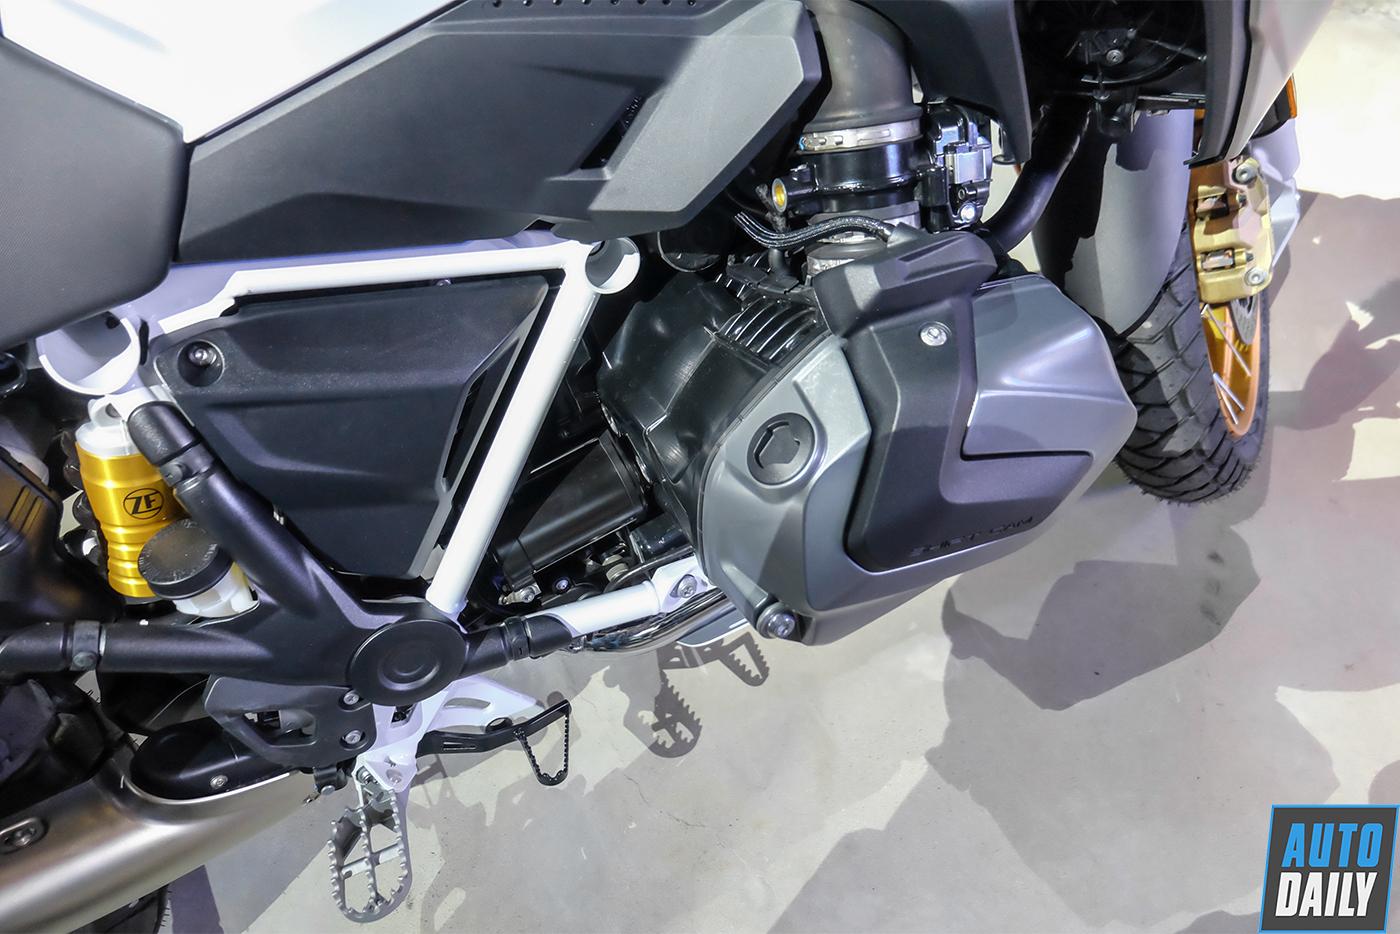 bmw-motorrad-r-1250-gs-2019-21.jpg